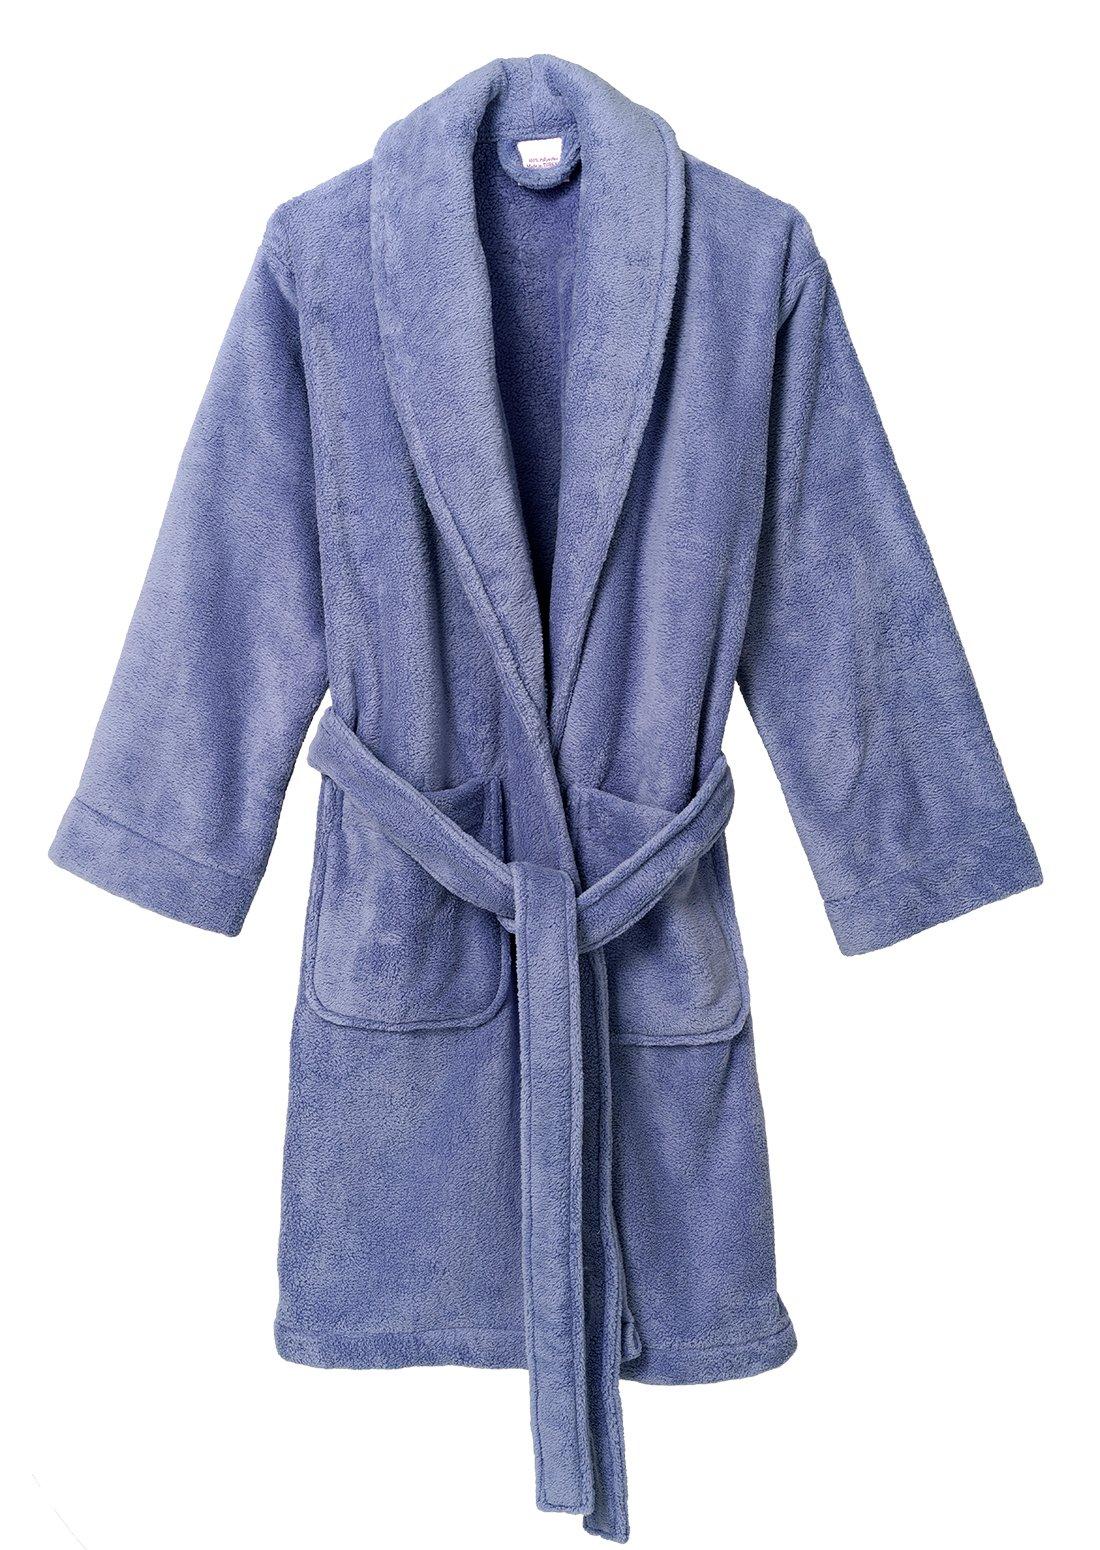 TowelSelections Women's Robe, Plush Fleece Short Spa Bathrobe Small Deep Periwinkle